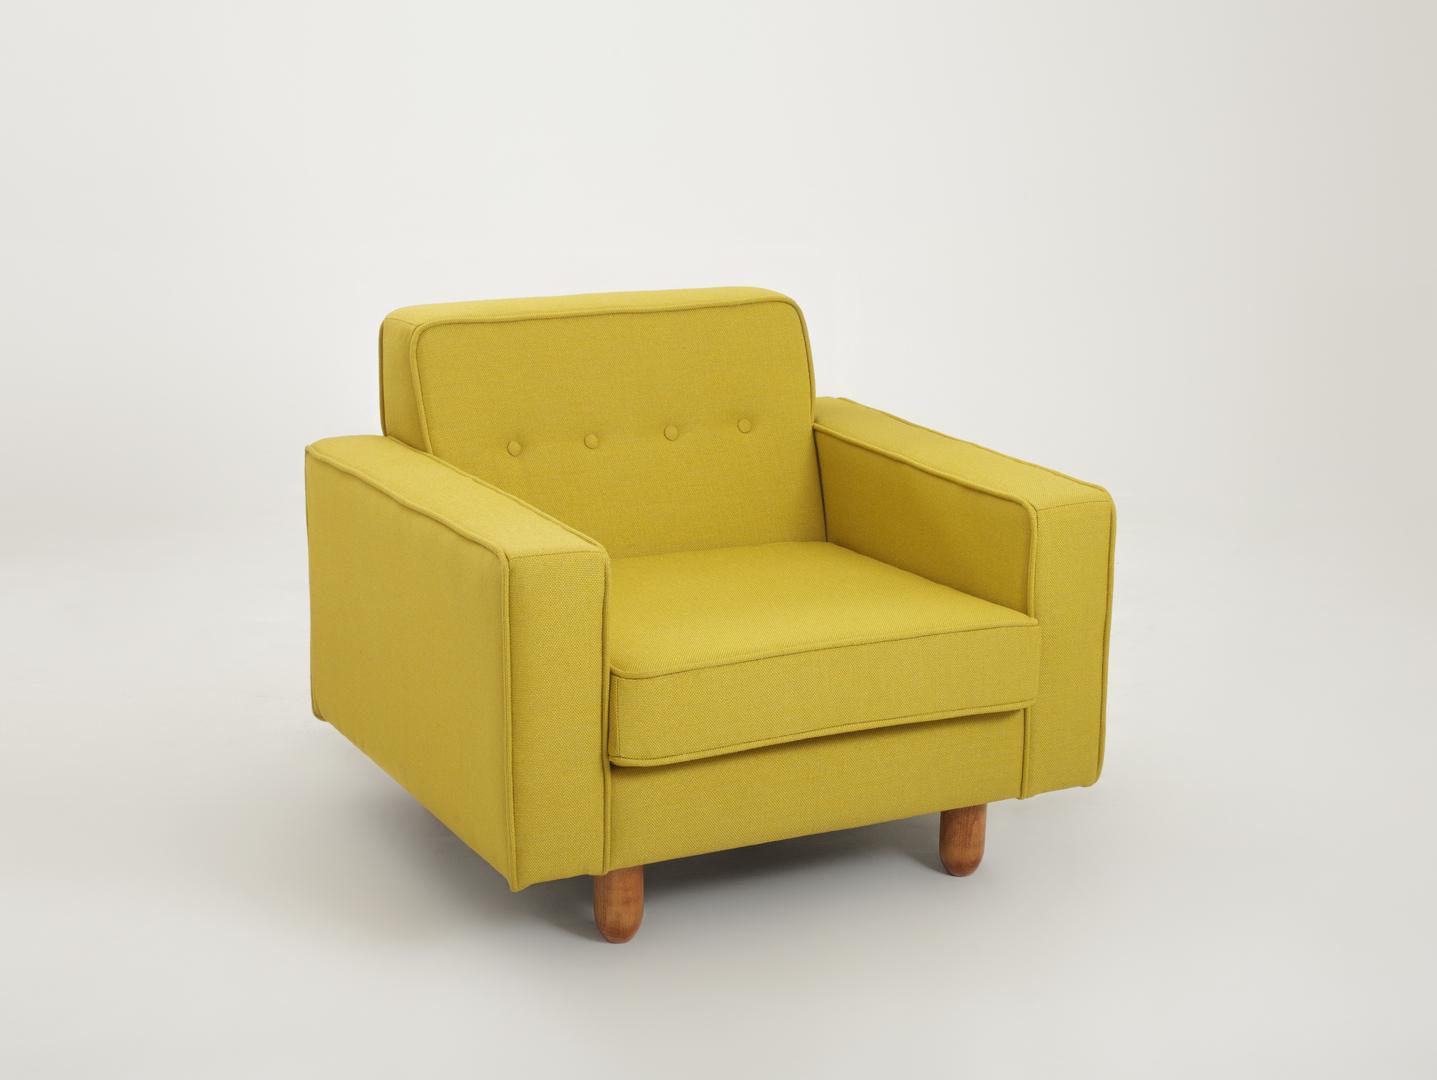 ZUGO armchair